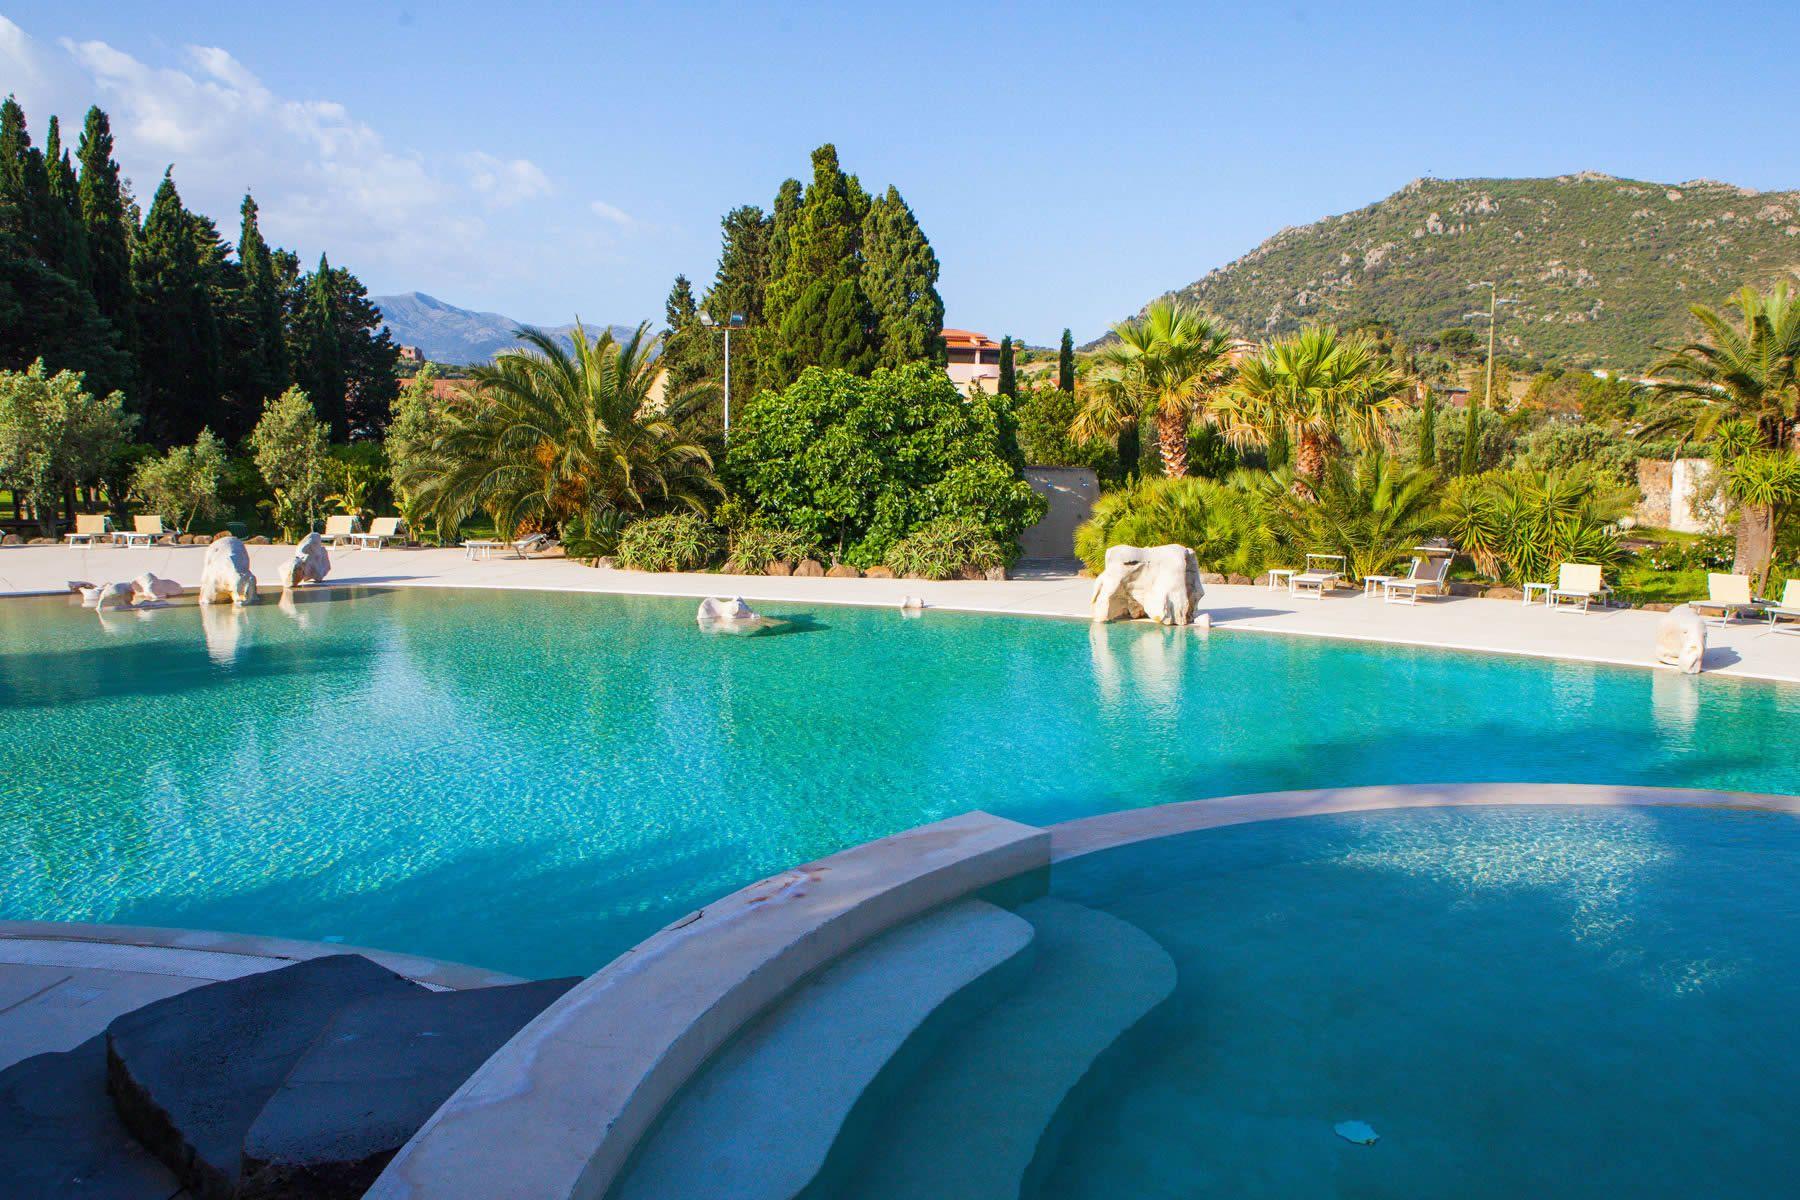 Hotel Piscina Sardegna Relax Hotel Guspini Tartheshotel